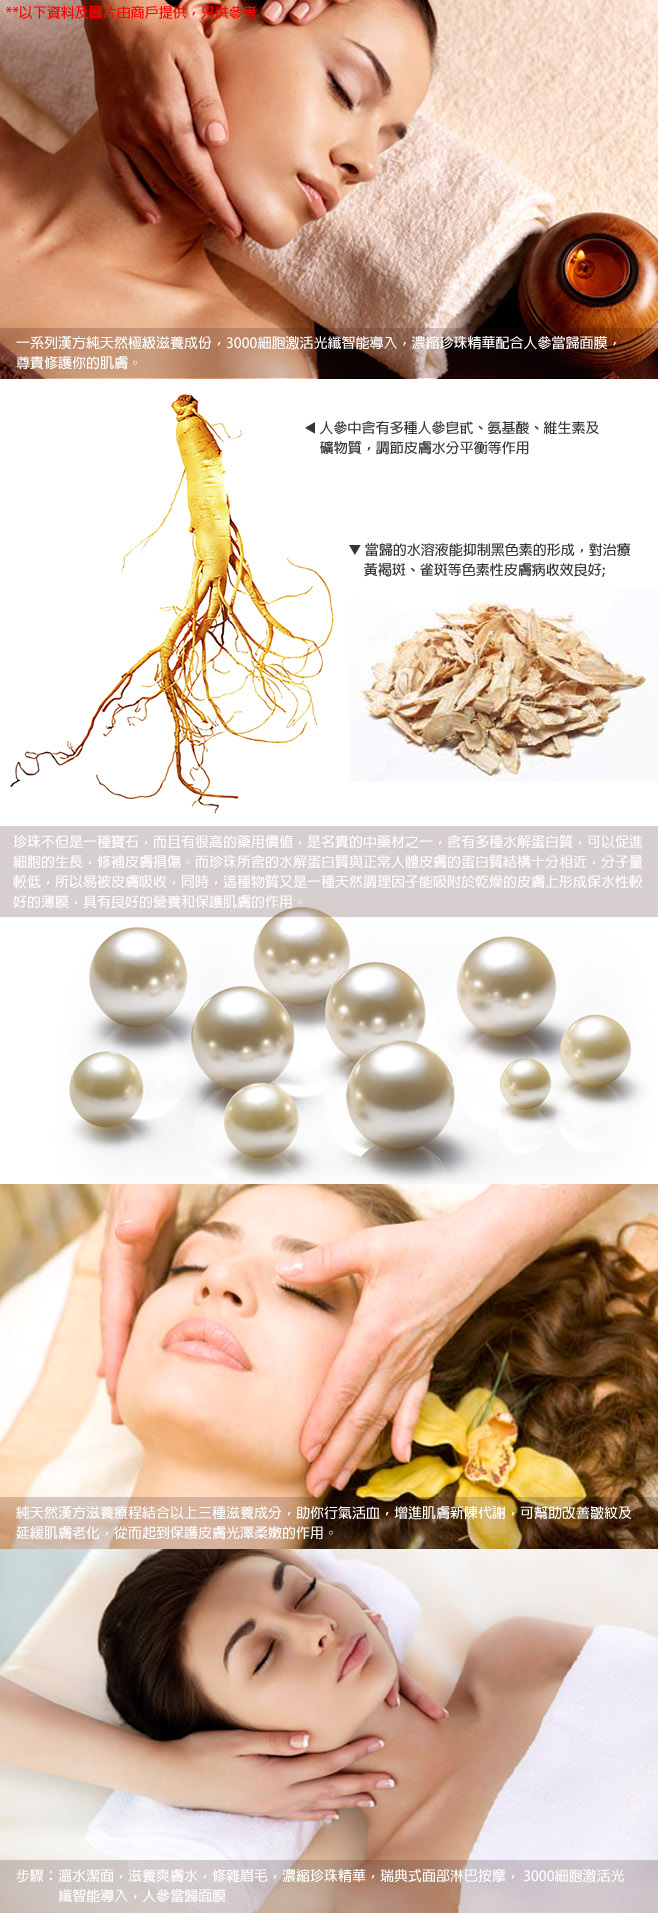 [Pilotage 派樂團購]Cosmic Beaute純天然漢方滋養療程